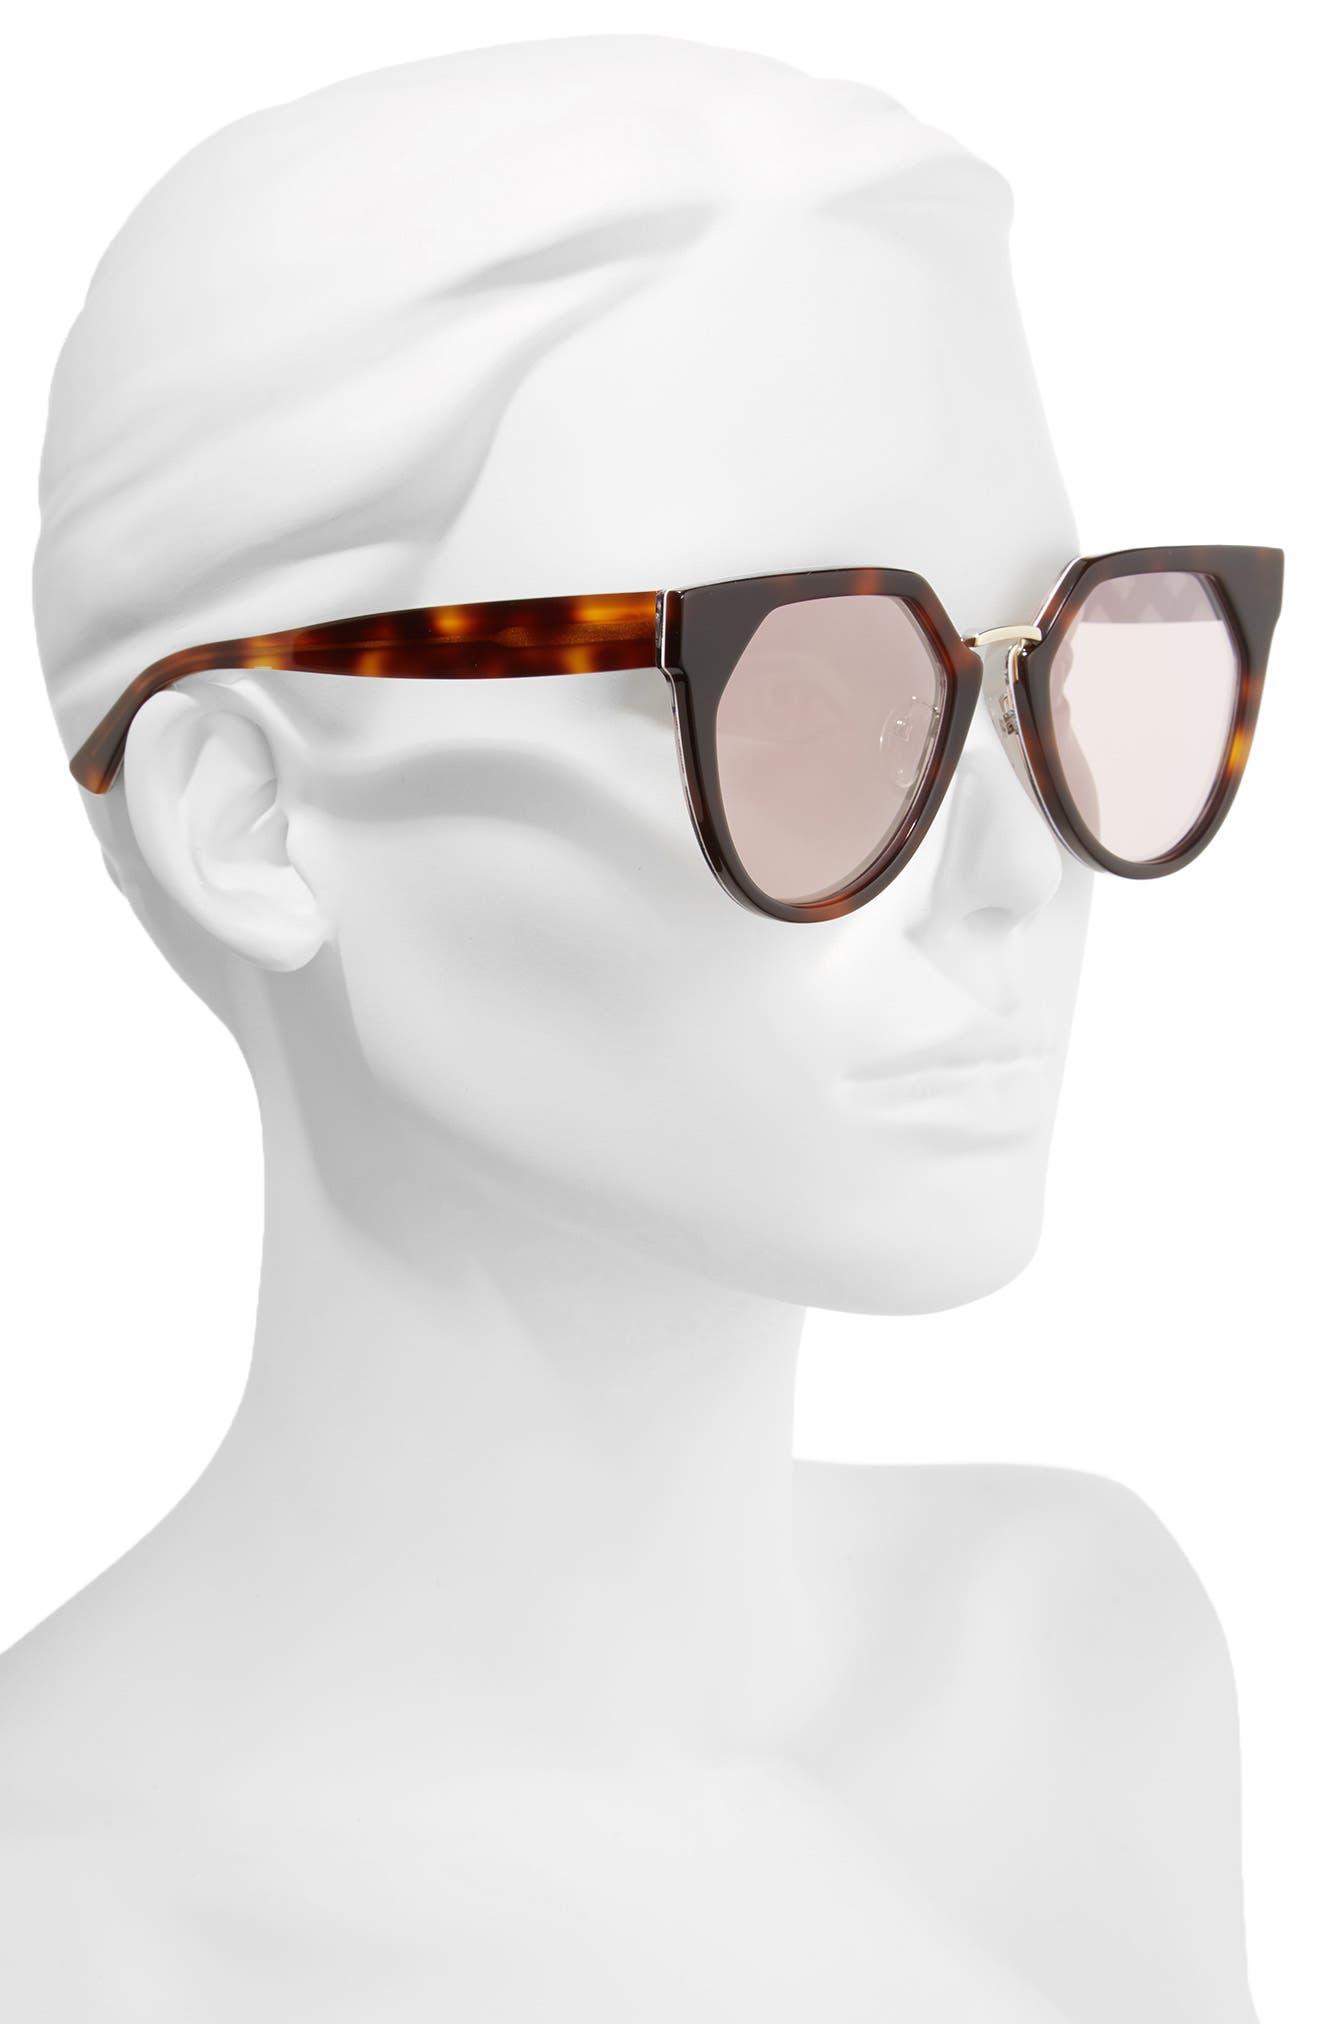 53mm Cat Eye Sunglasses,                             Alternate thumbnail 4, color,